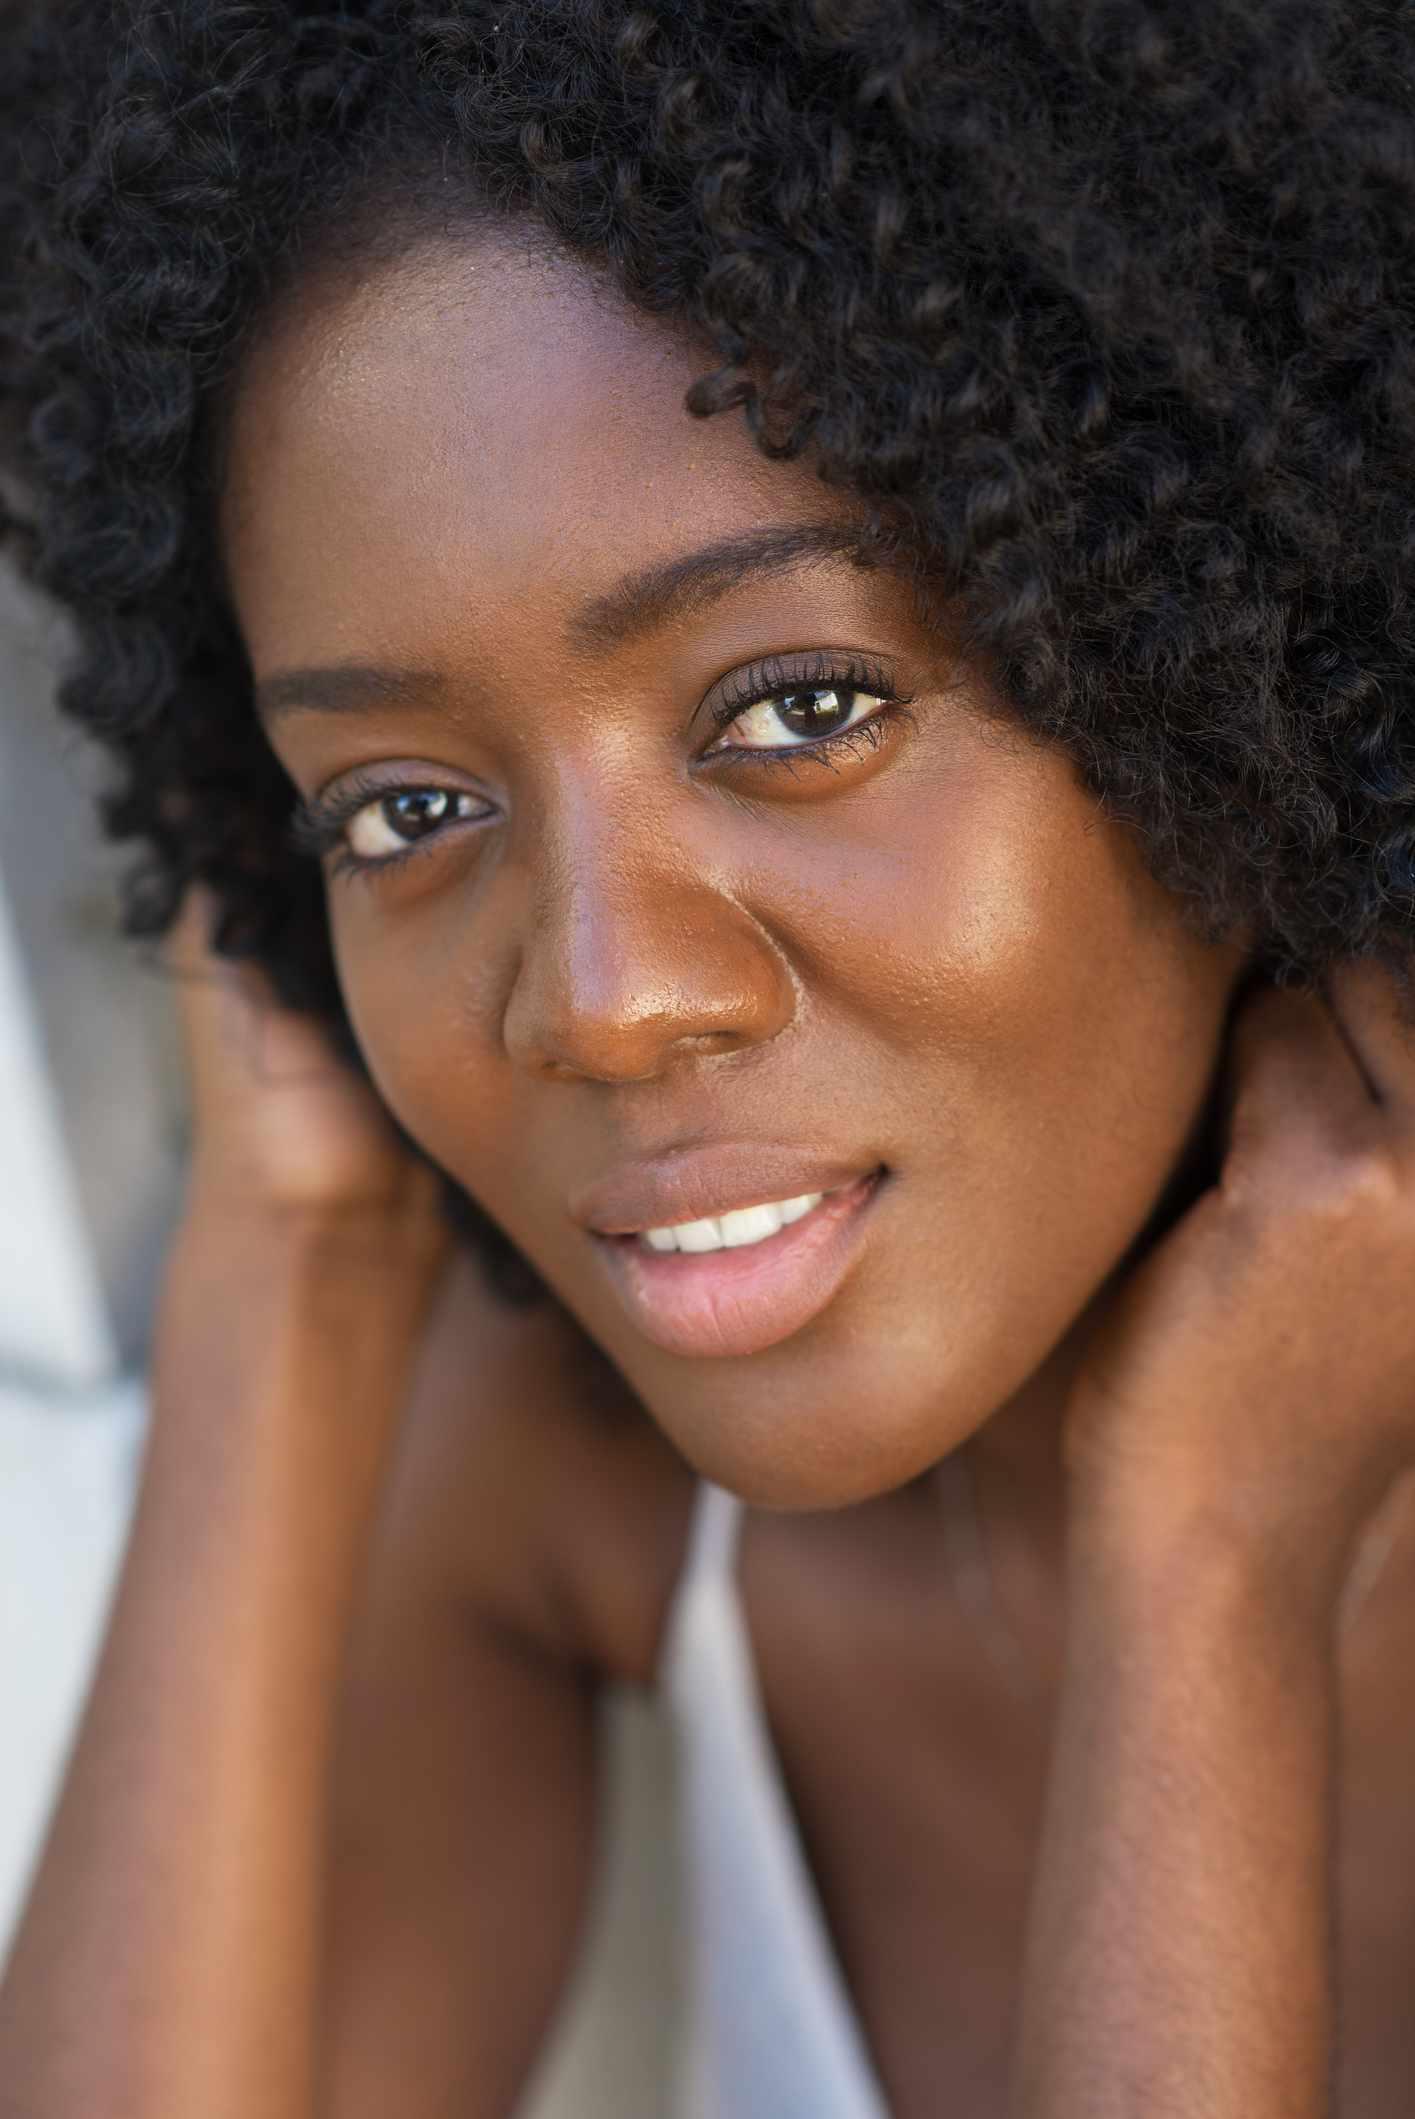 woman up close